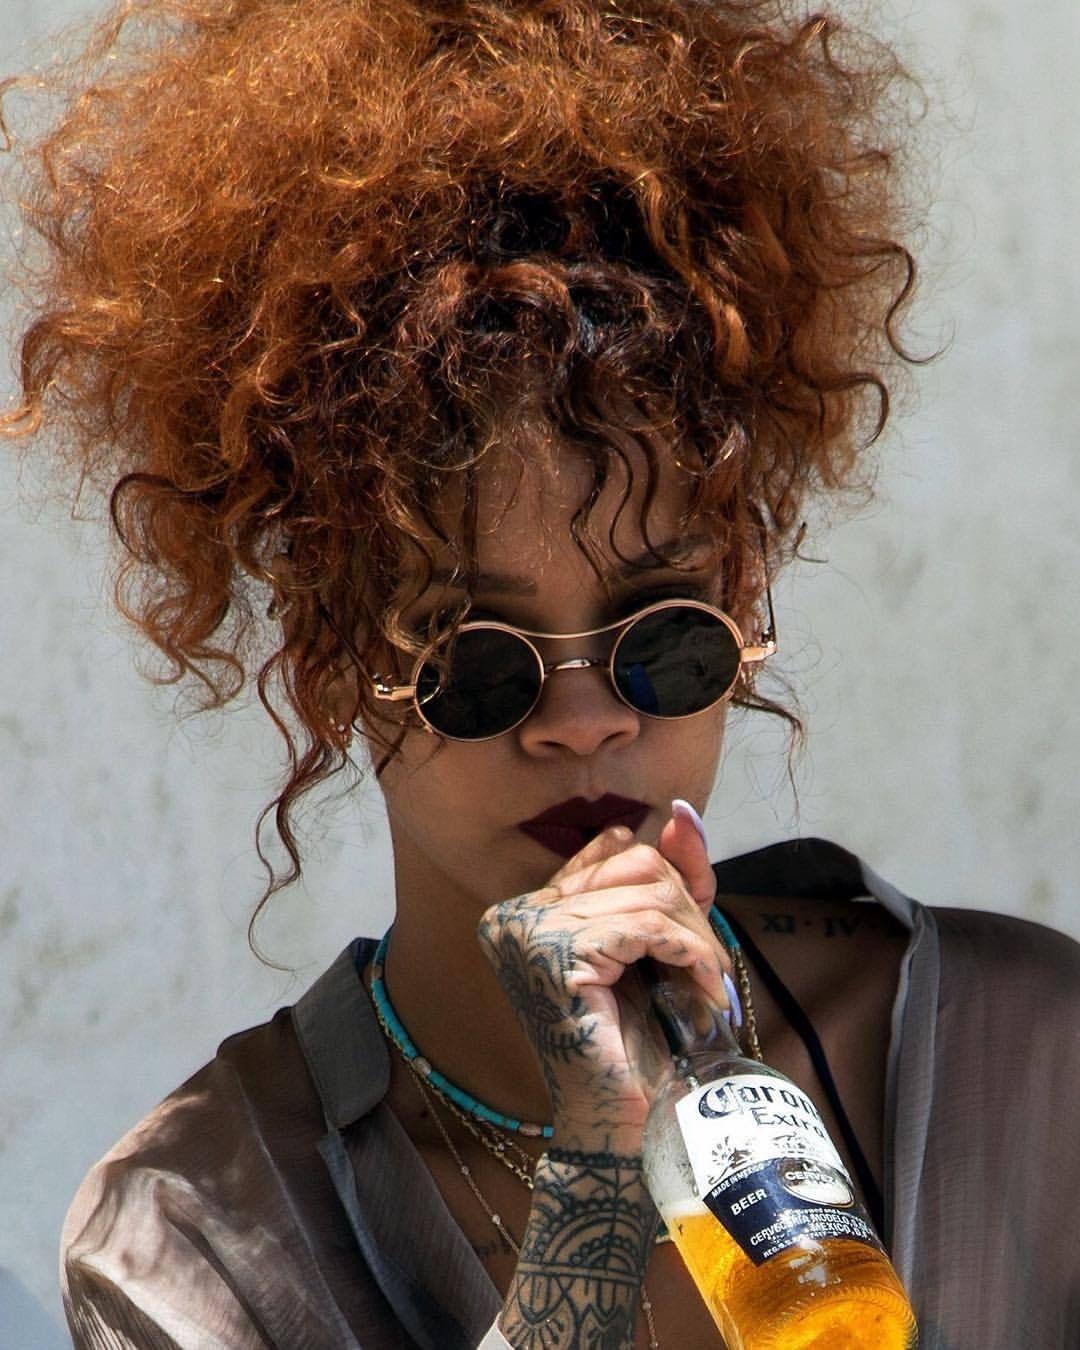 Pin by sydney jackson on RiRi!!!! | Rihanna fenty, Rihanna